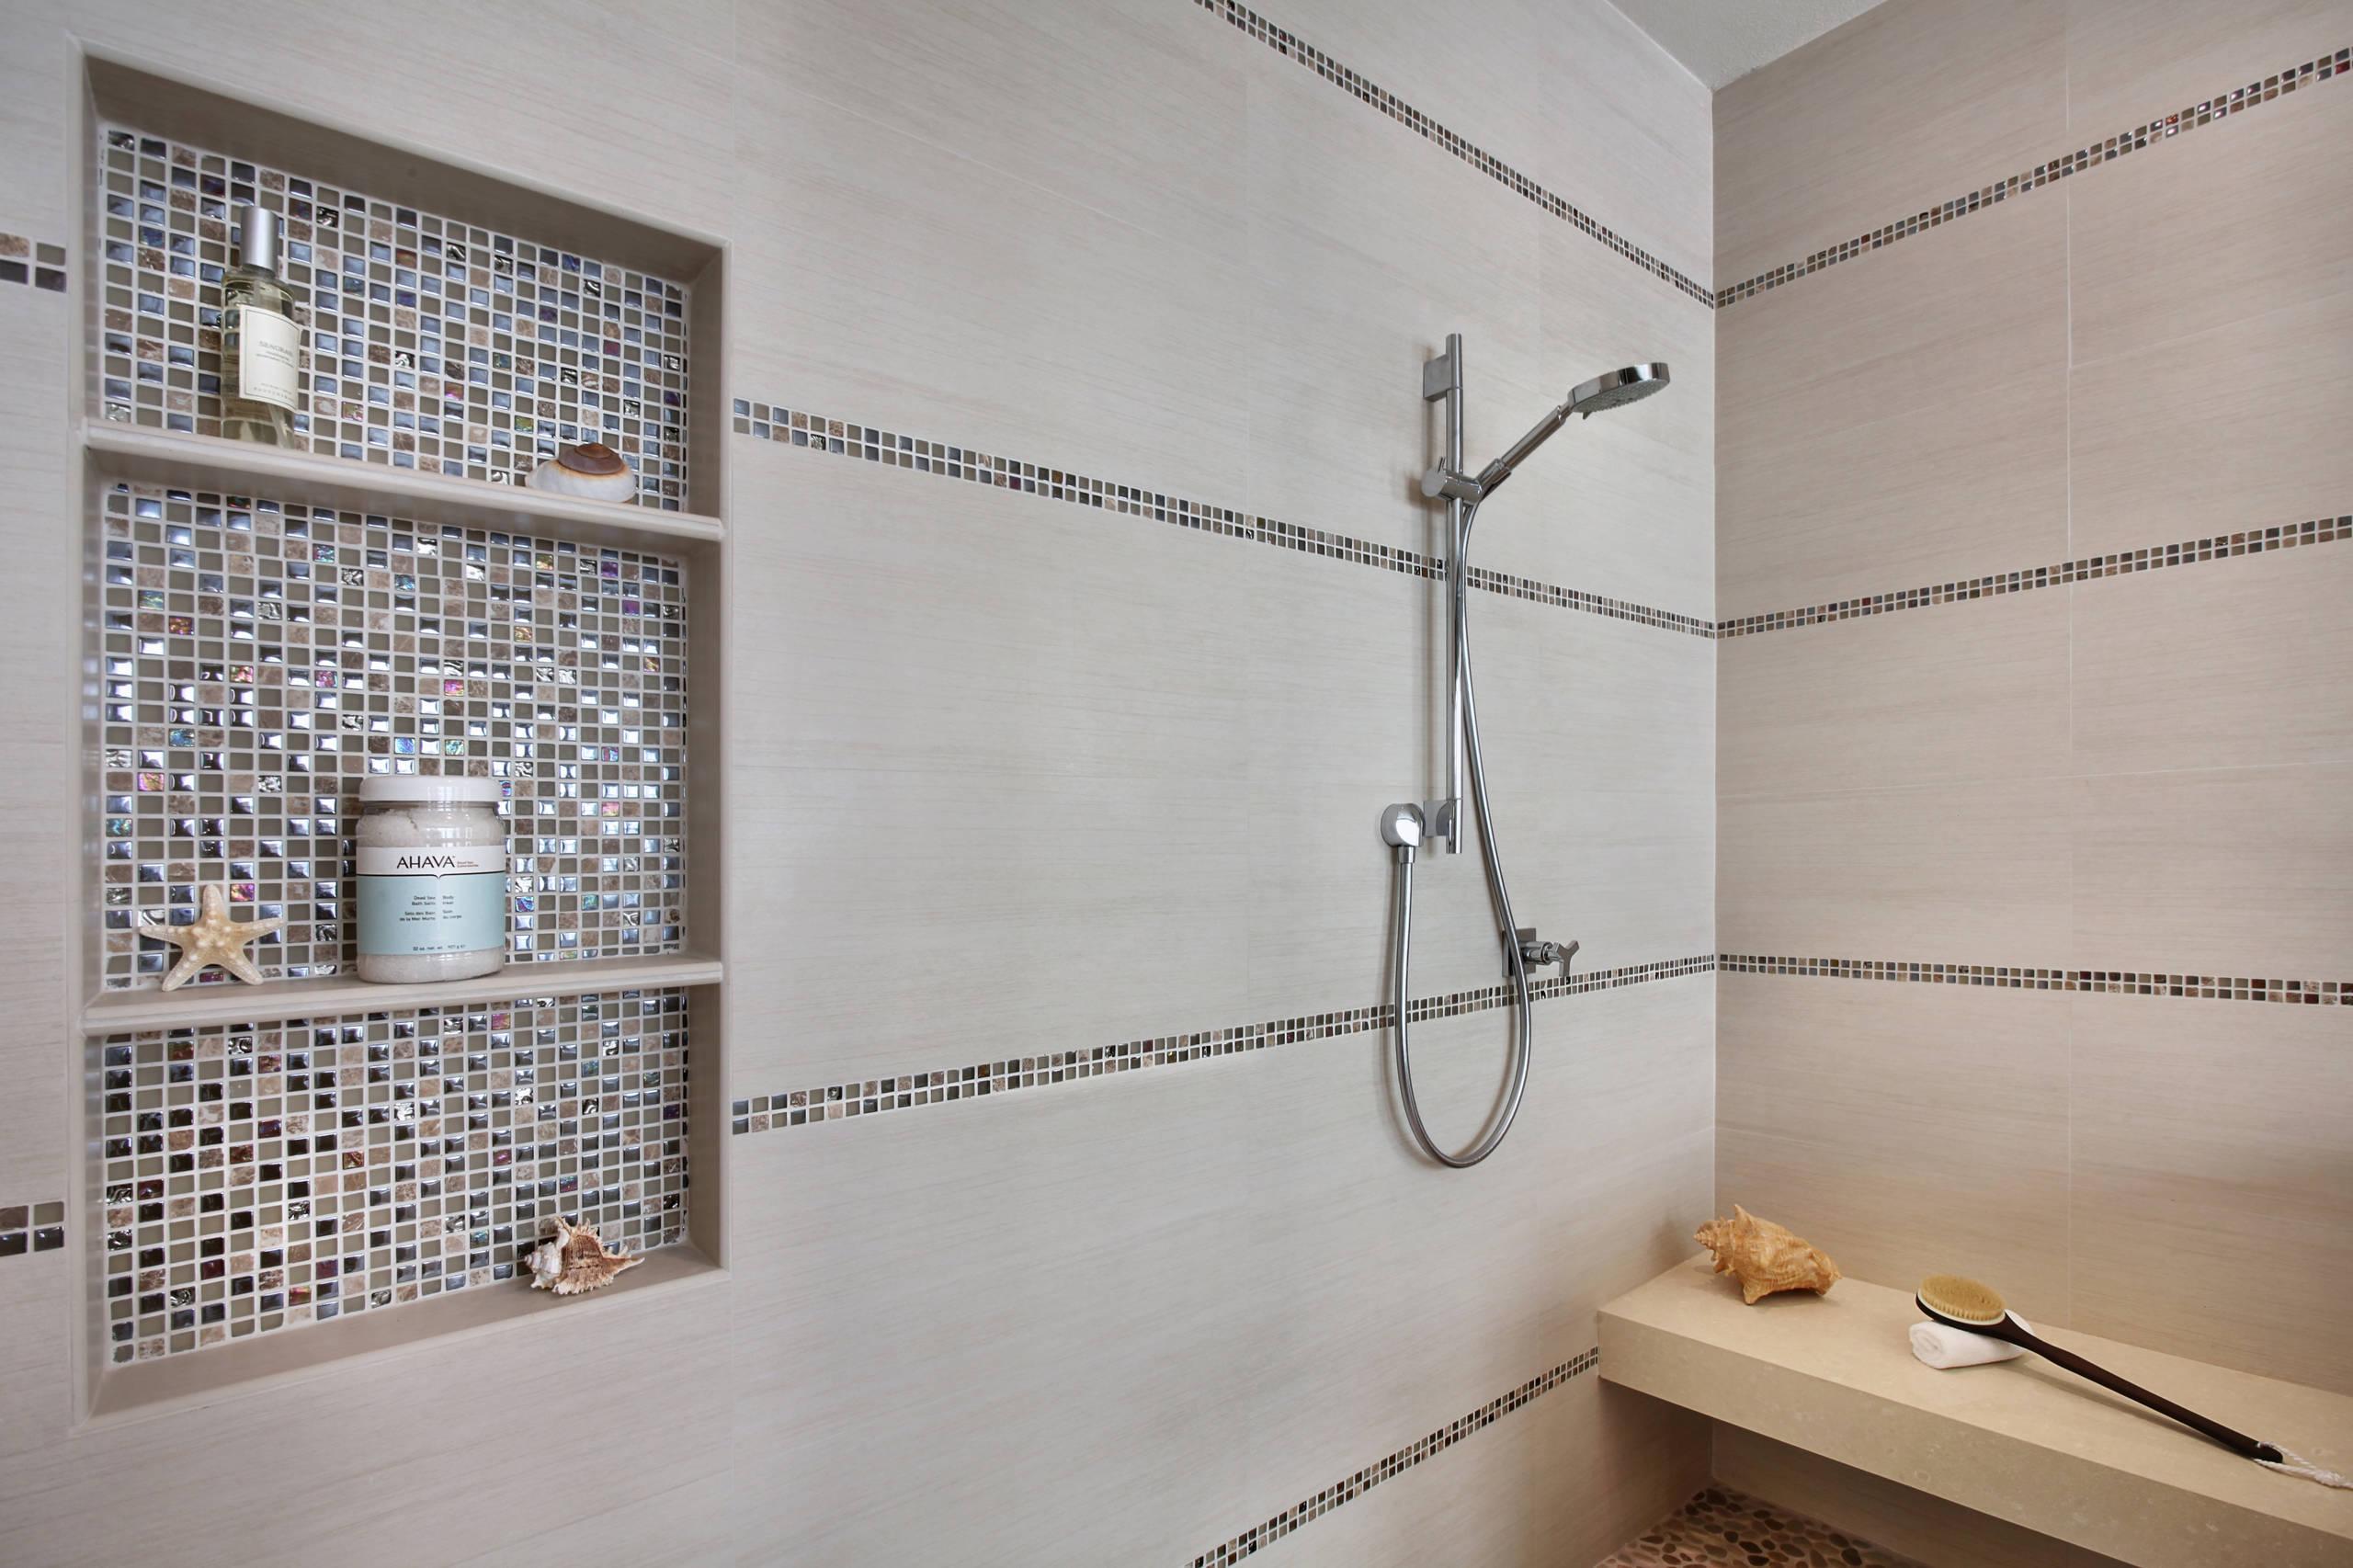 Yorba Linda Master Bathroom